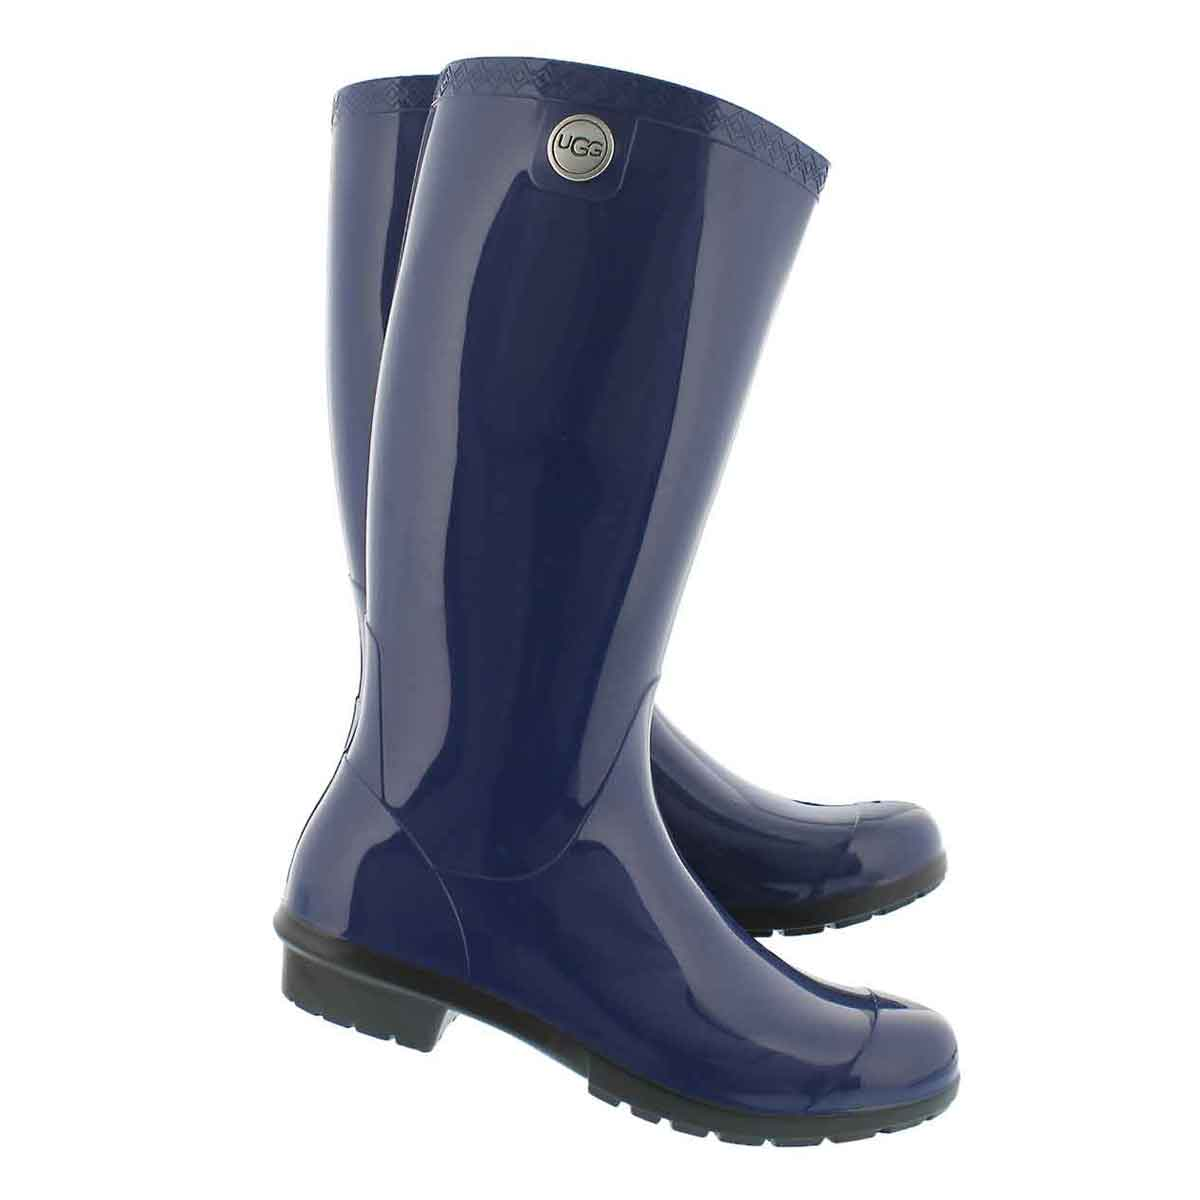 Lds Shaye blue jay wtpf rain boot